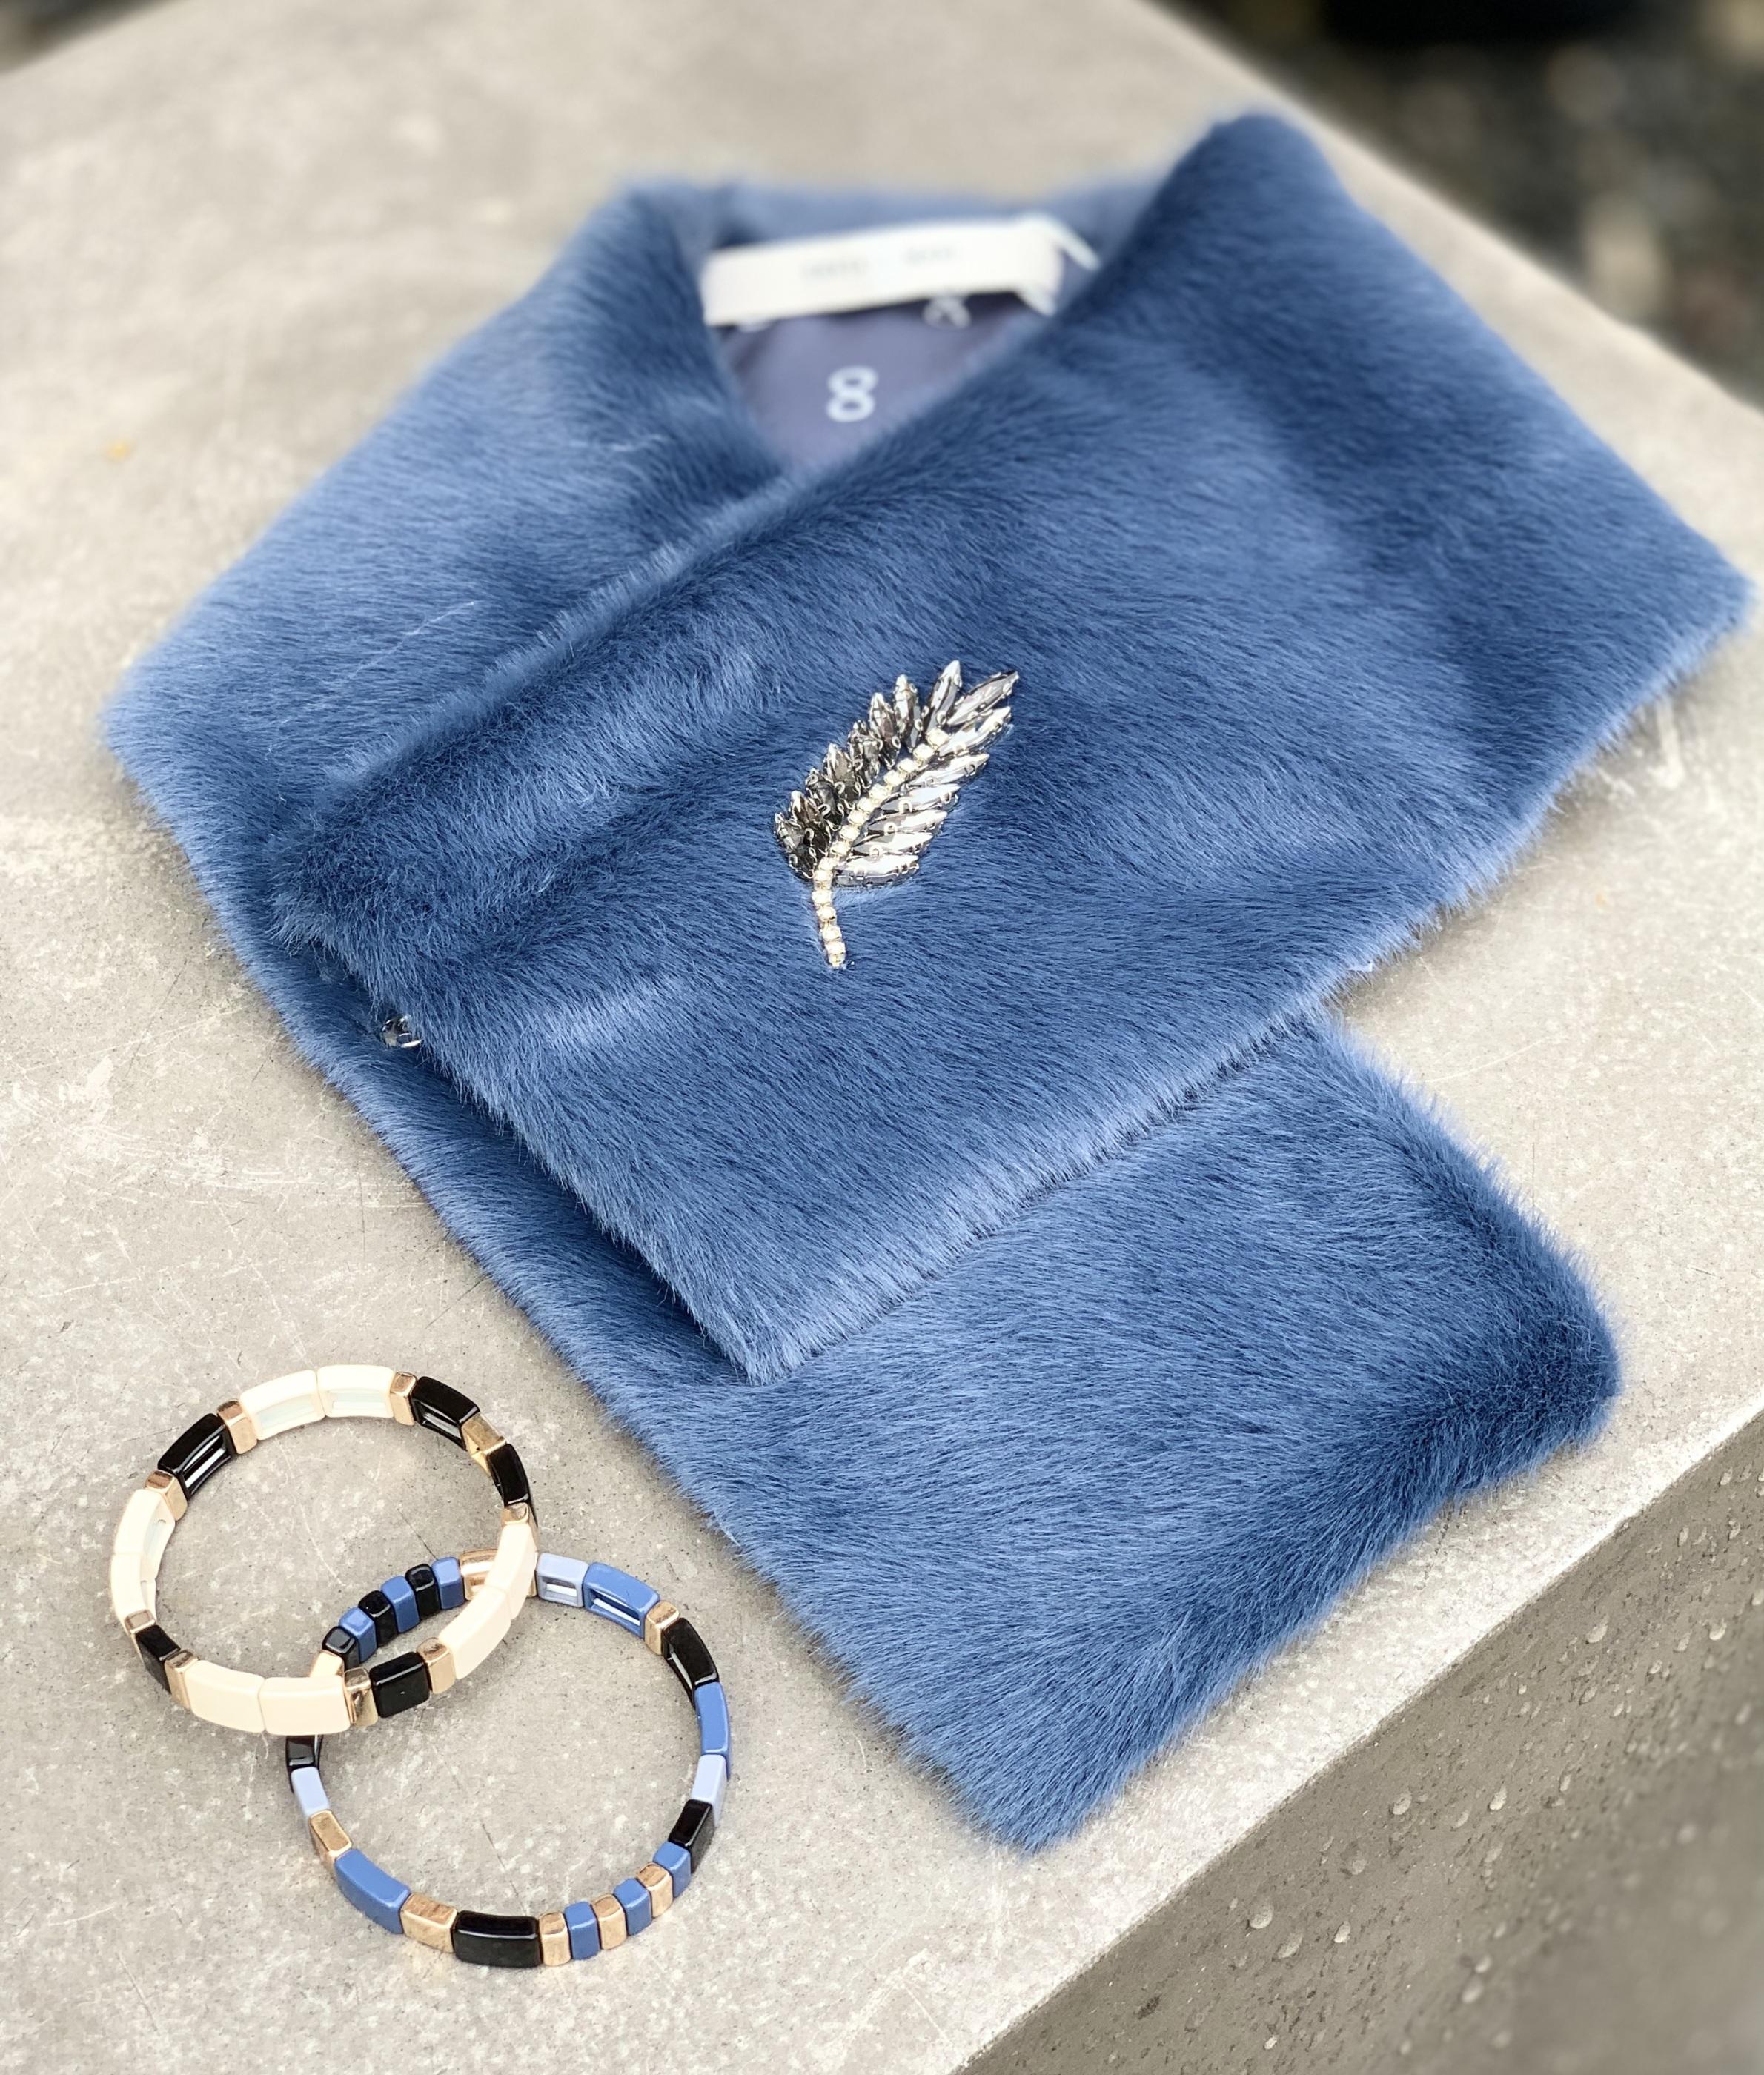 COSTA MANI BLUE fuskpäls IMAGE BY ME